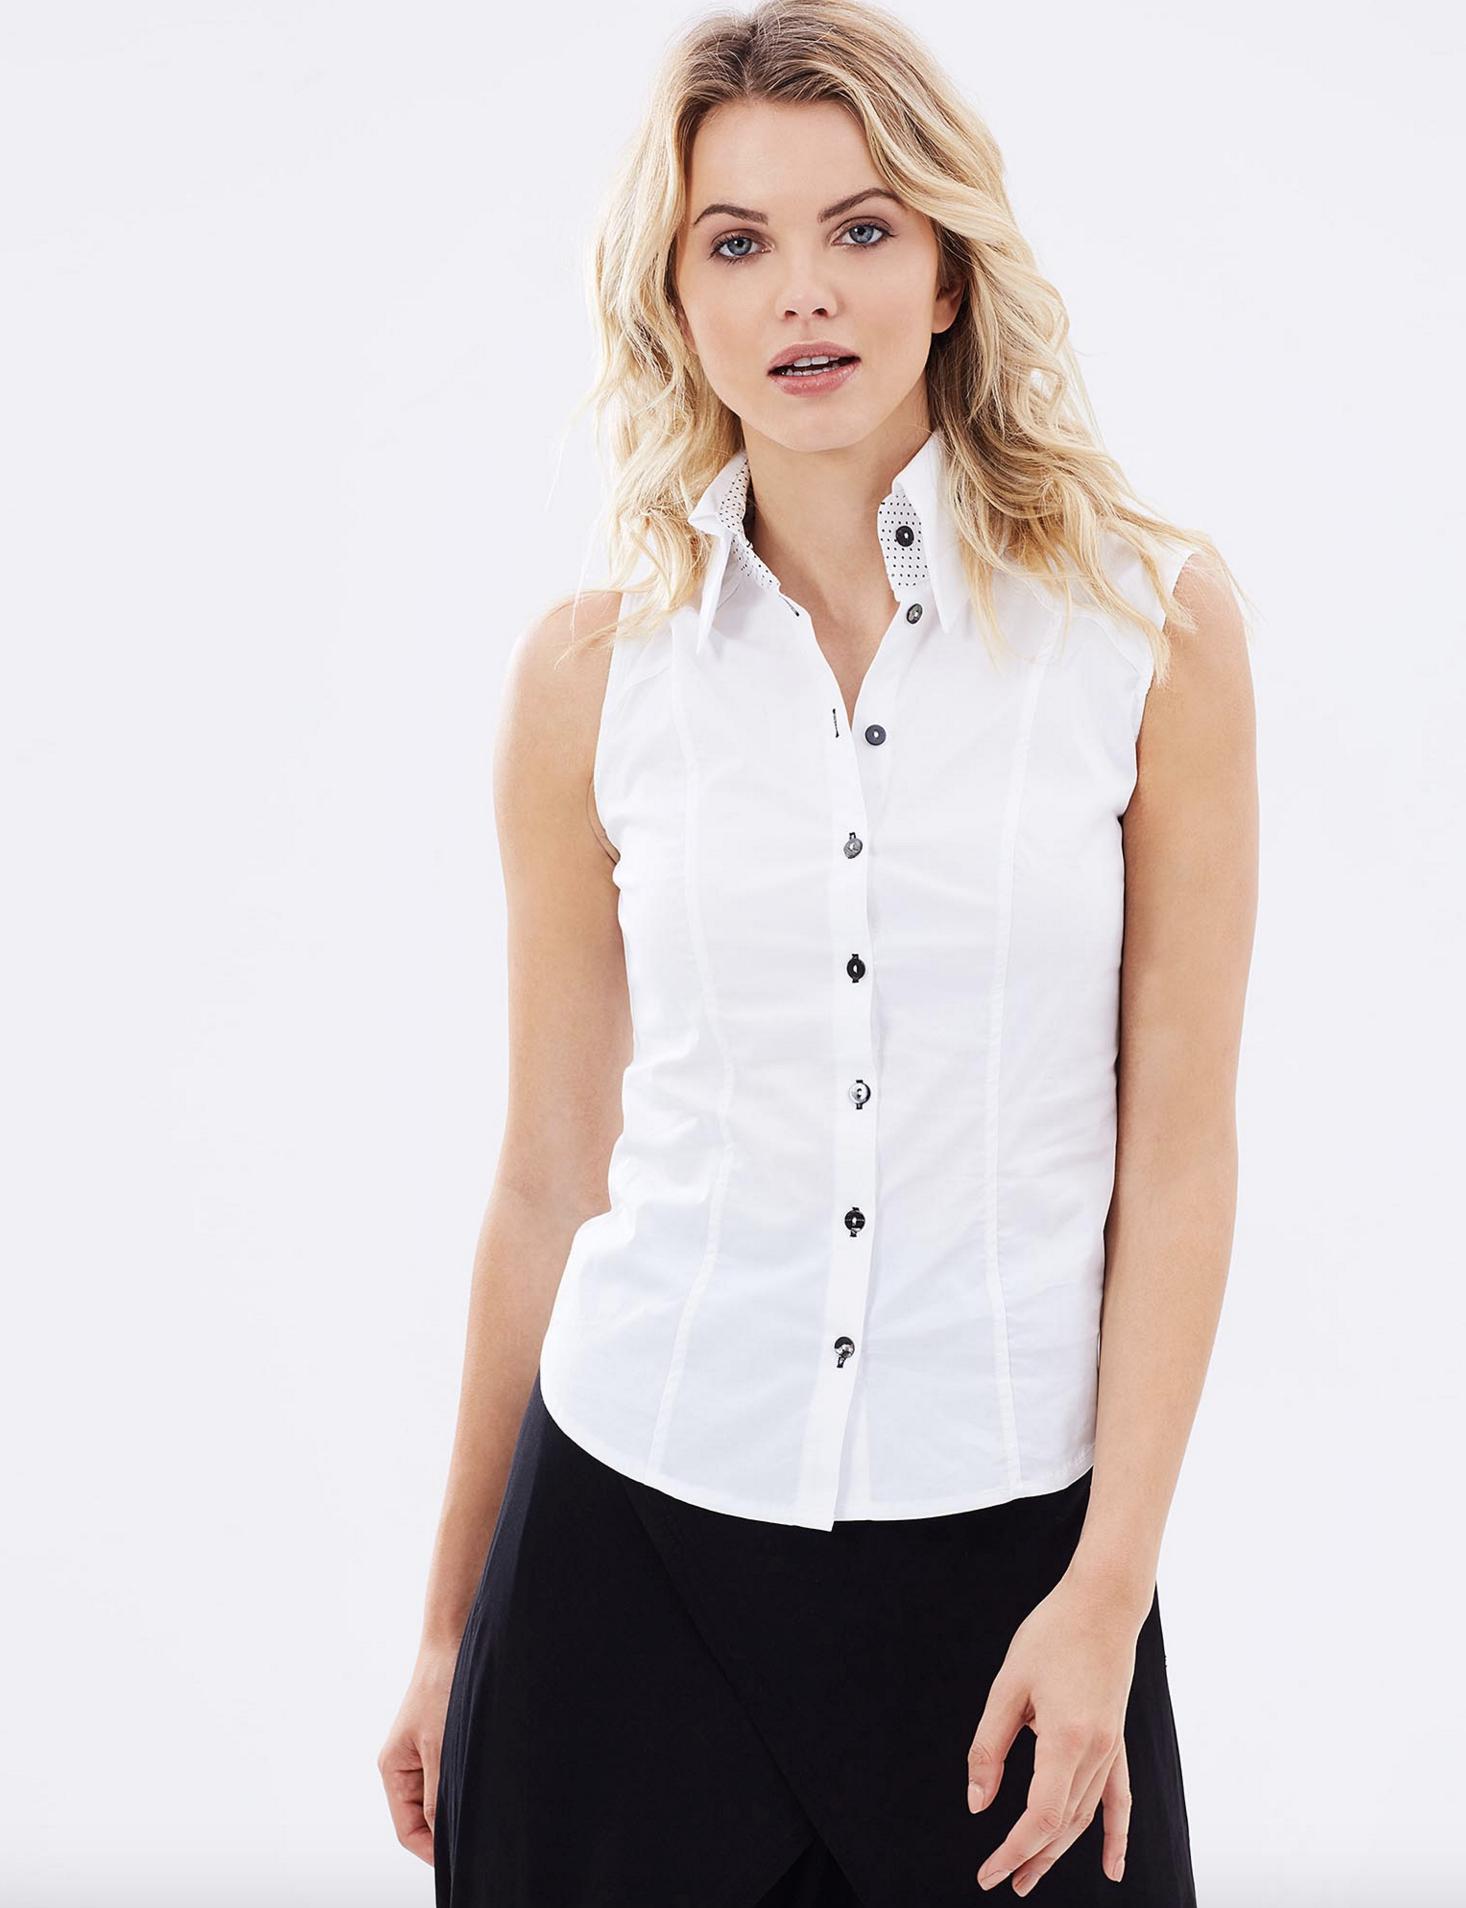 Privilege high collar shirt $69